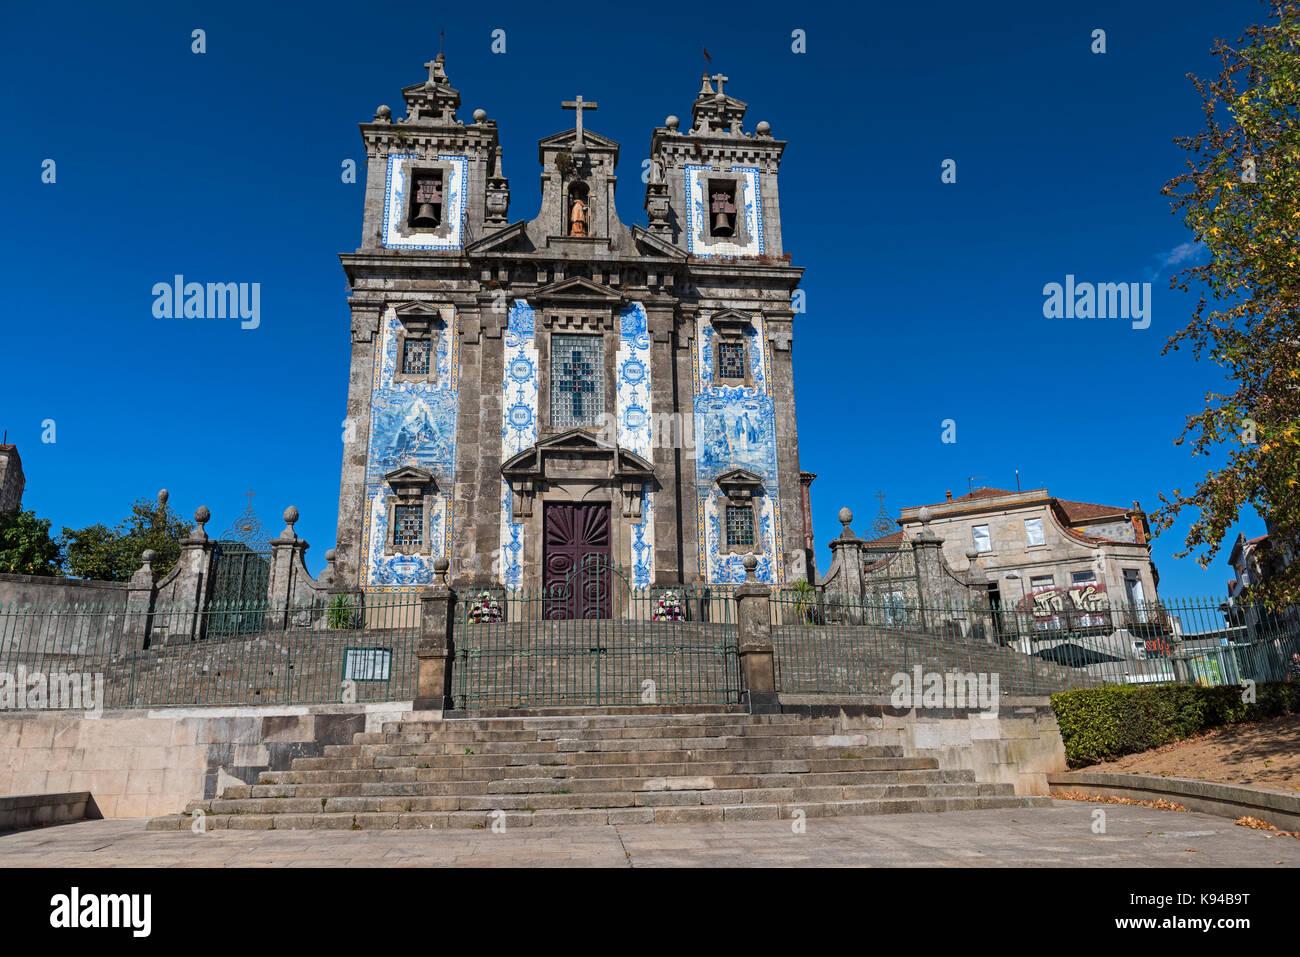 Igreja de Santo Ildefonso. Saint Ildefonso Church Porto Portugal - Stock Image